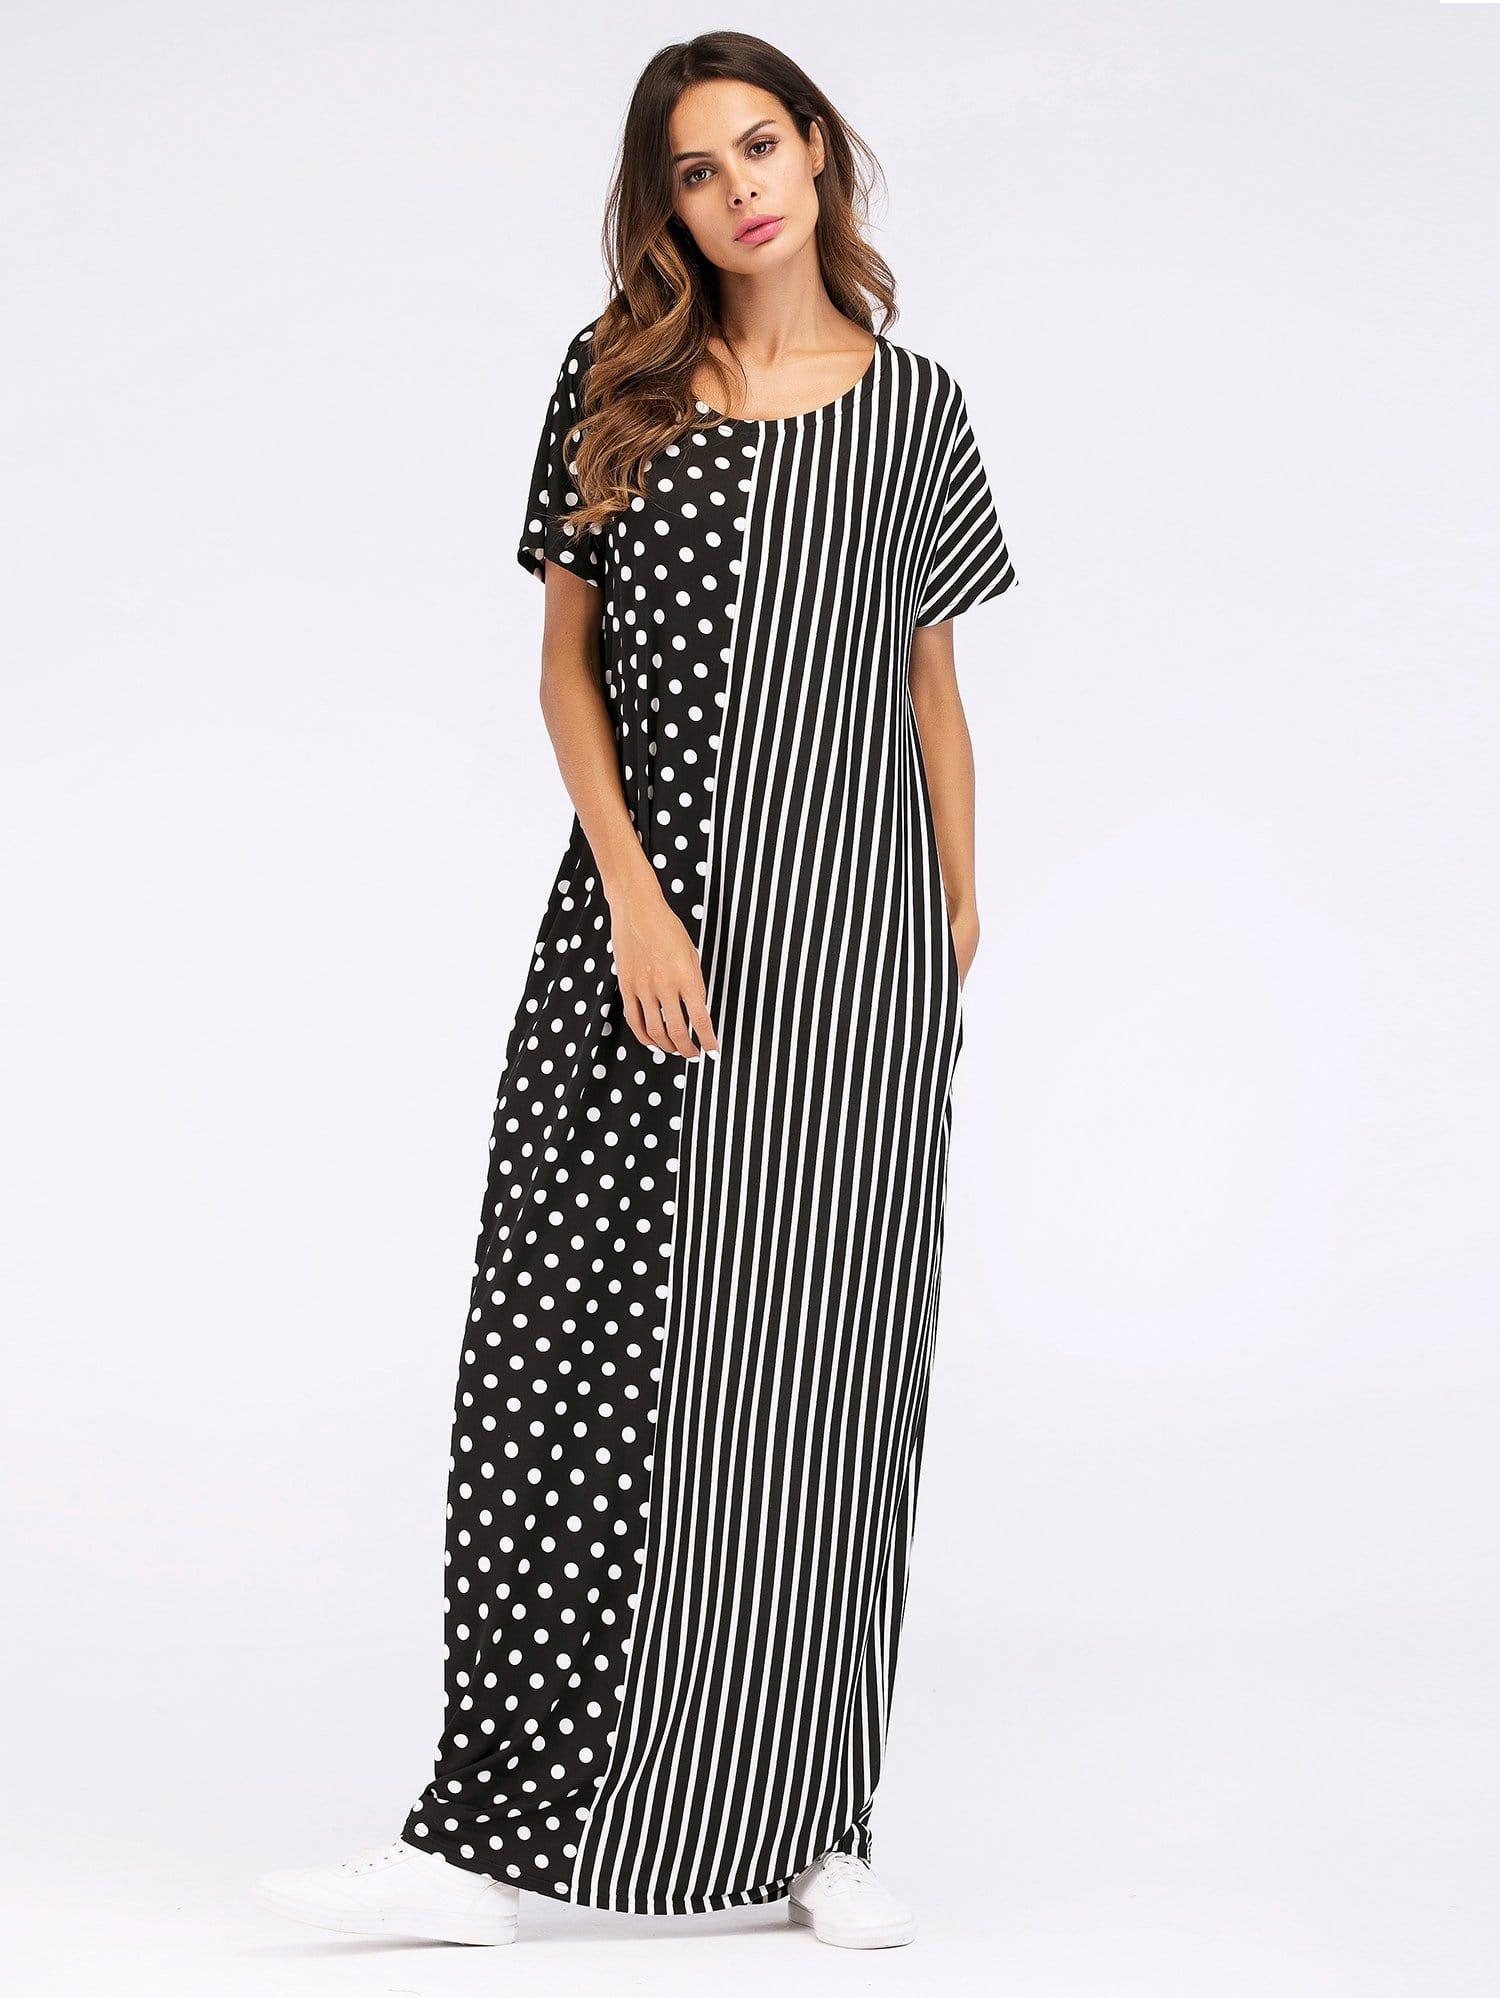 Stripe And Dot Print Contrast Longline Dress letter and stripe print glitter dress